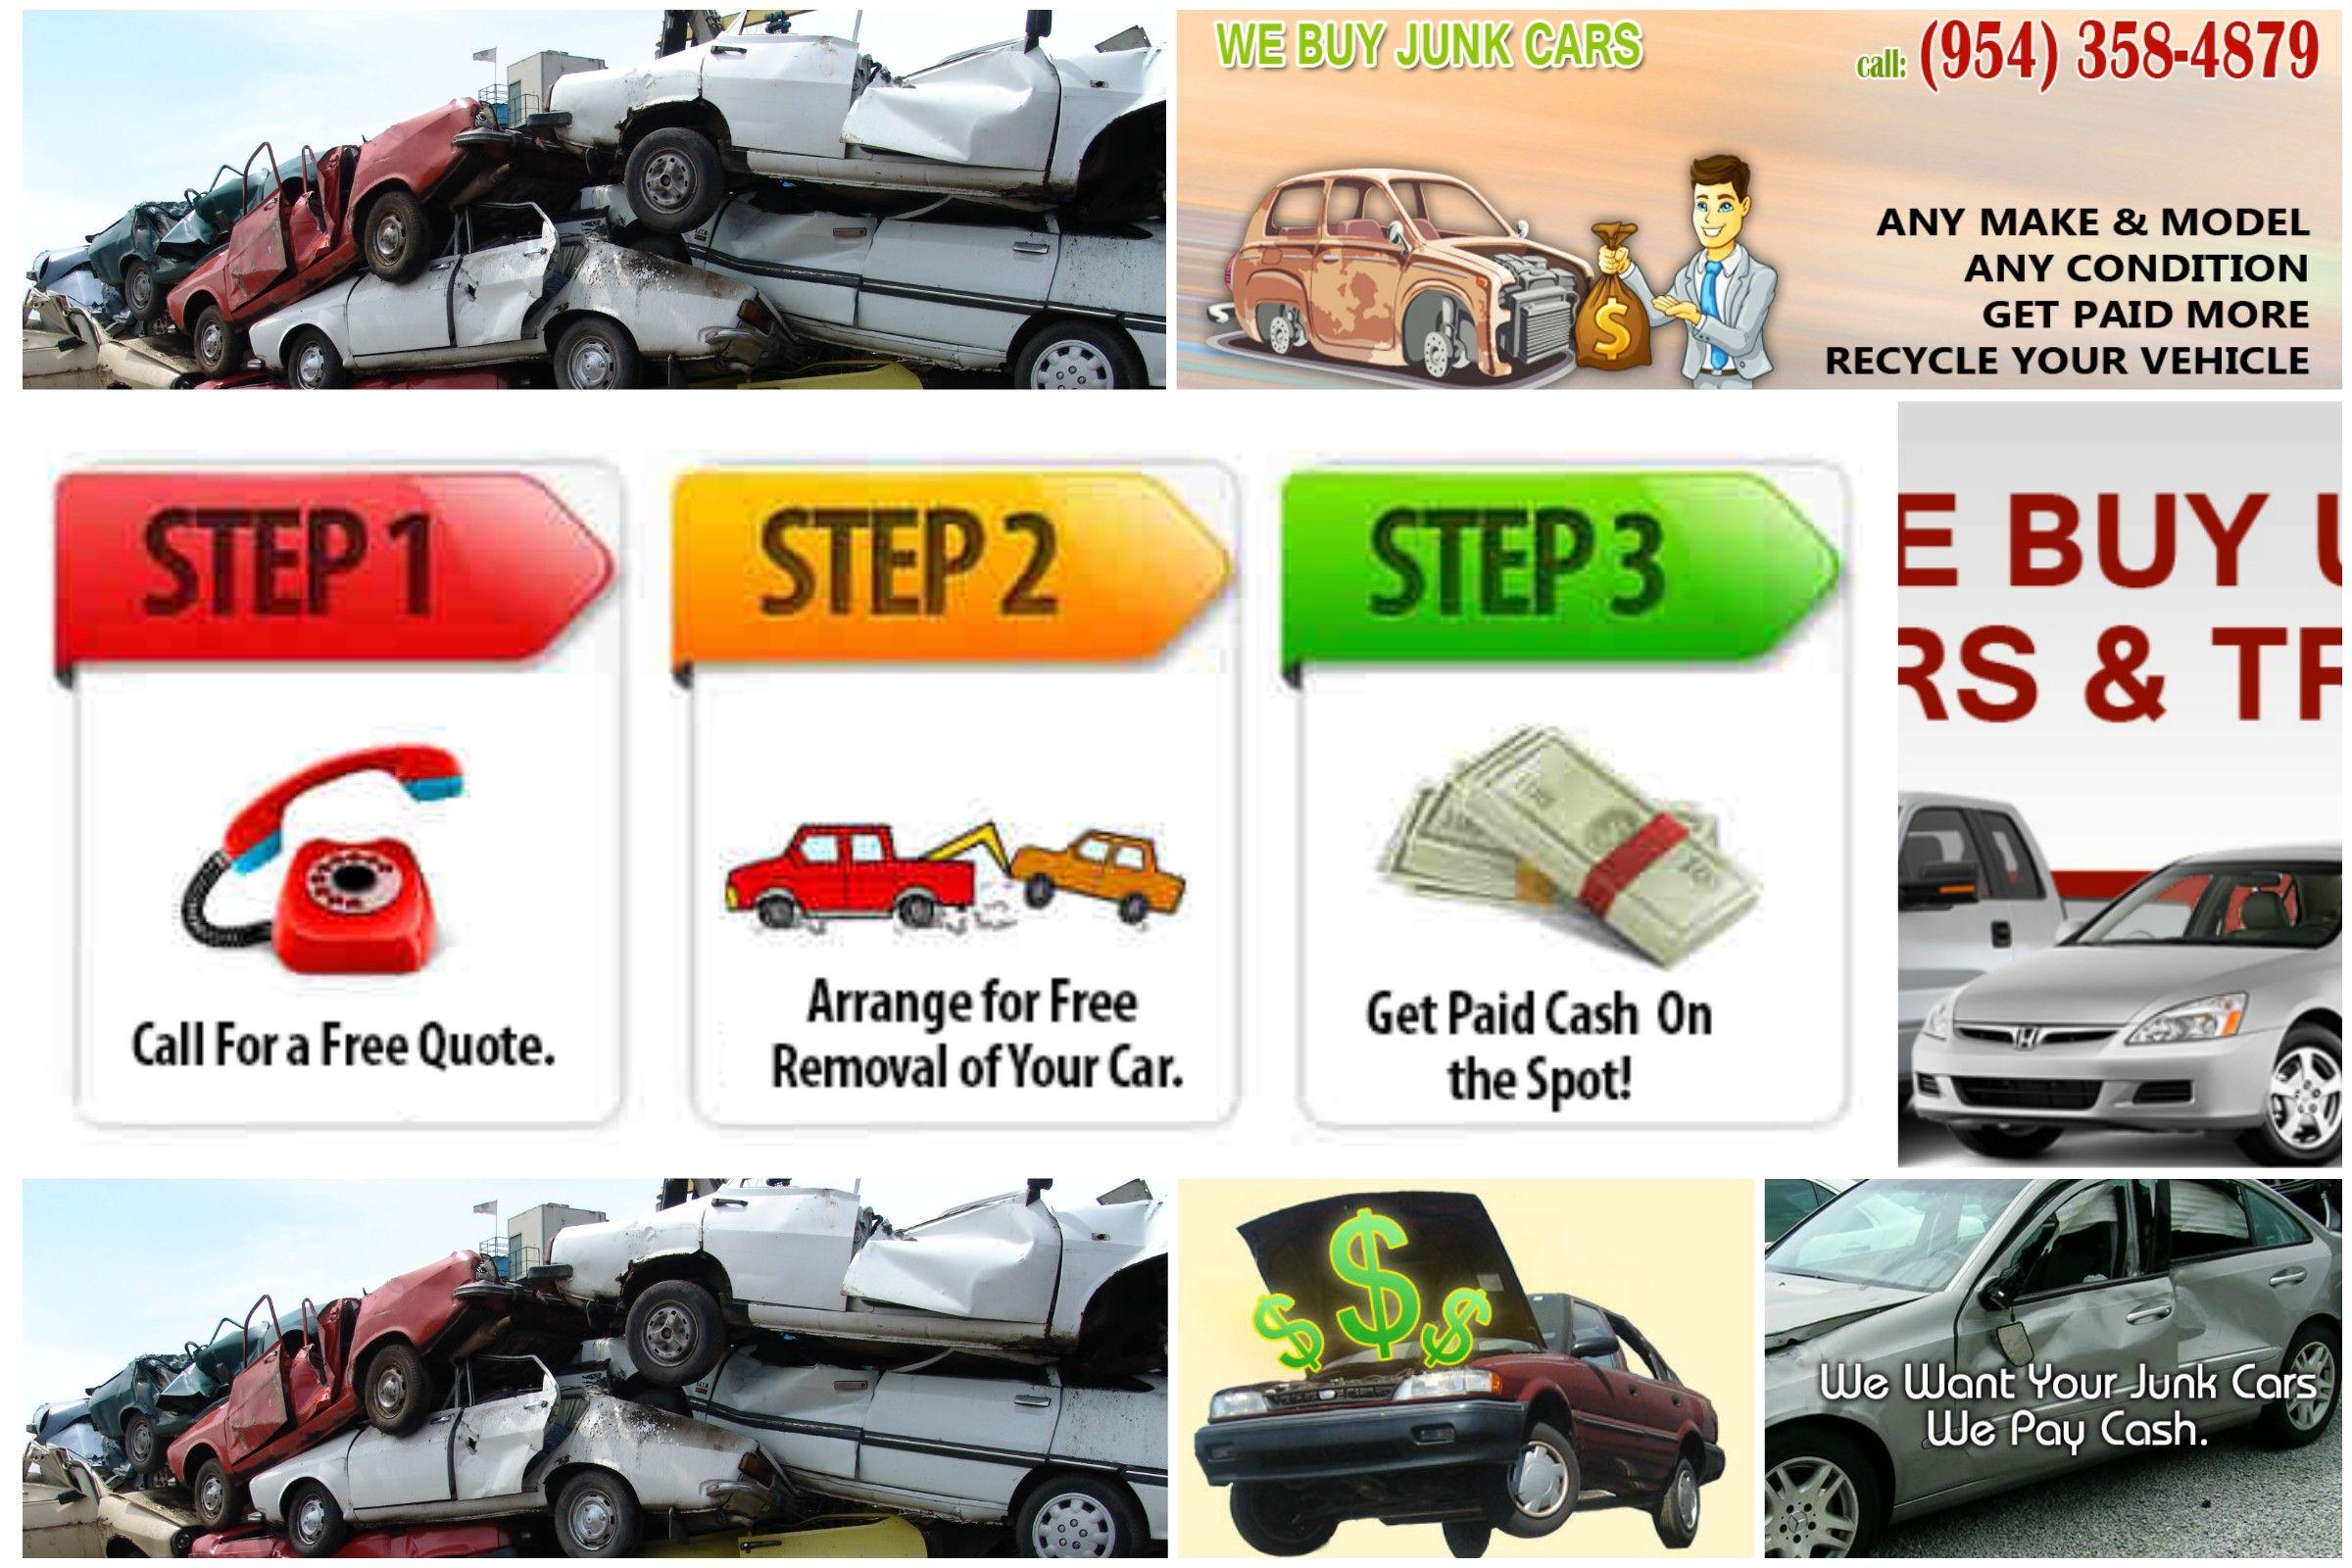 http://www.cashforjunkcarmiami.com/ Cash for Junk Car Miami will ...